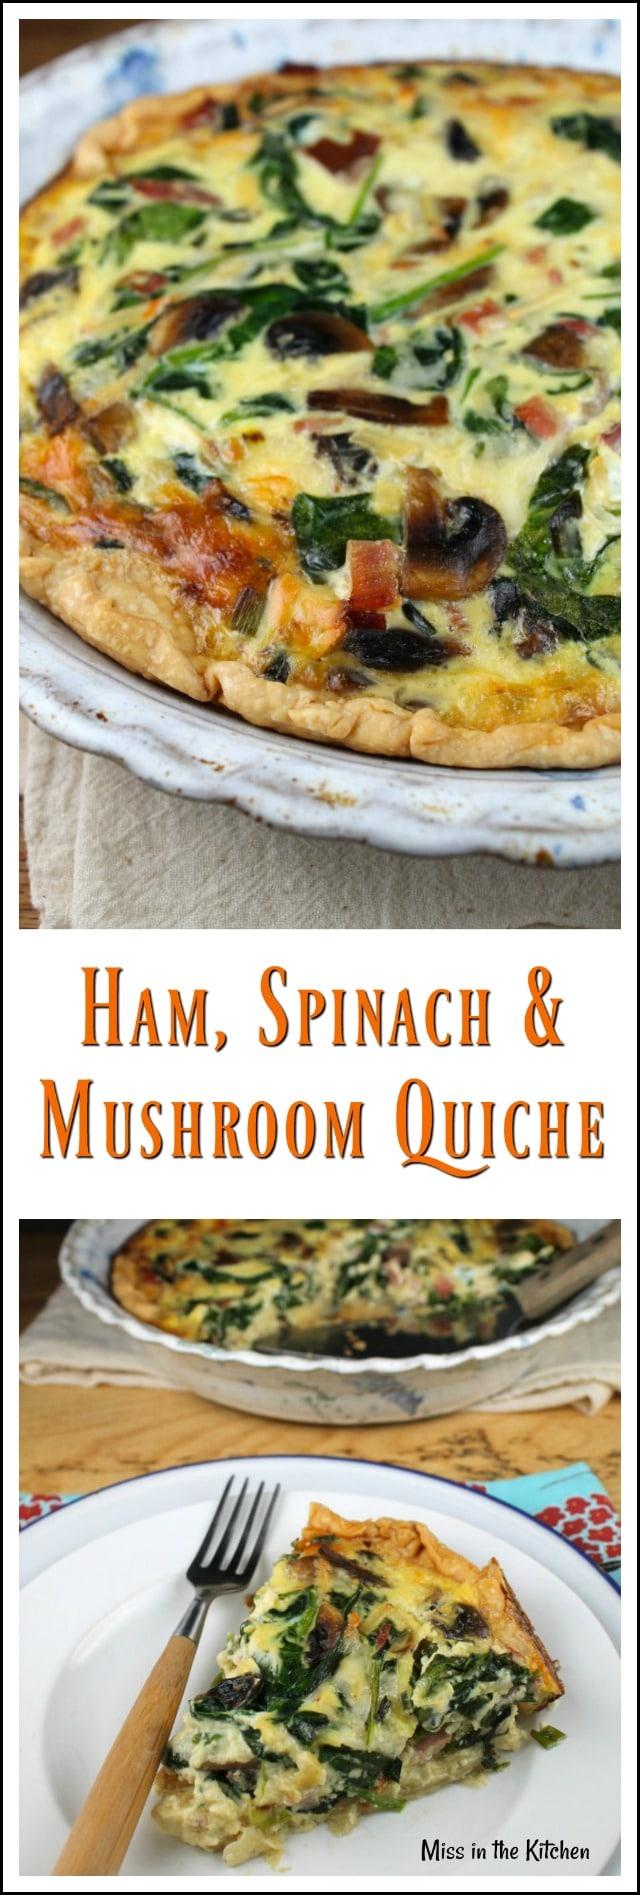 Ham Spinach & Mushroom Quiche Recipe perfect for brunch ~ MissintheKitchen.com #ad #Brunch